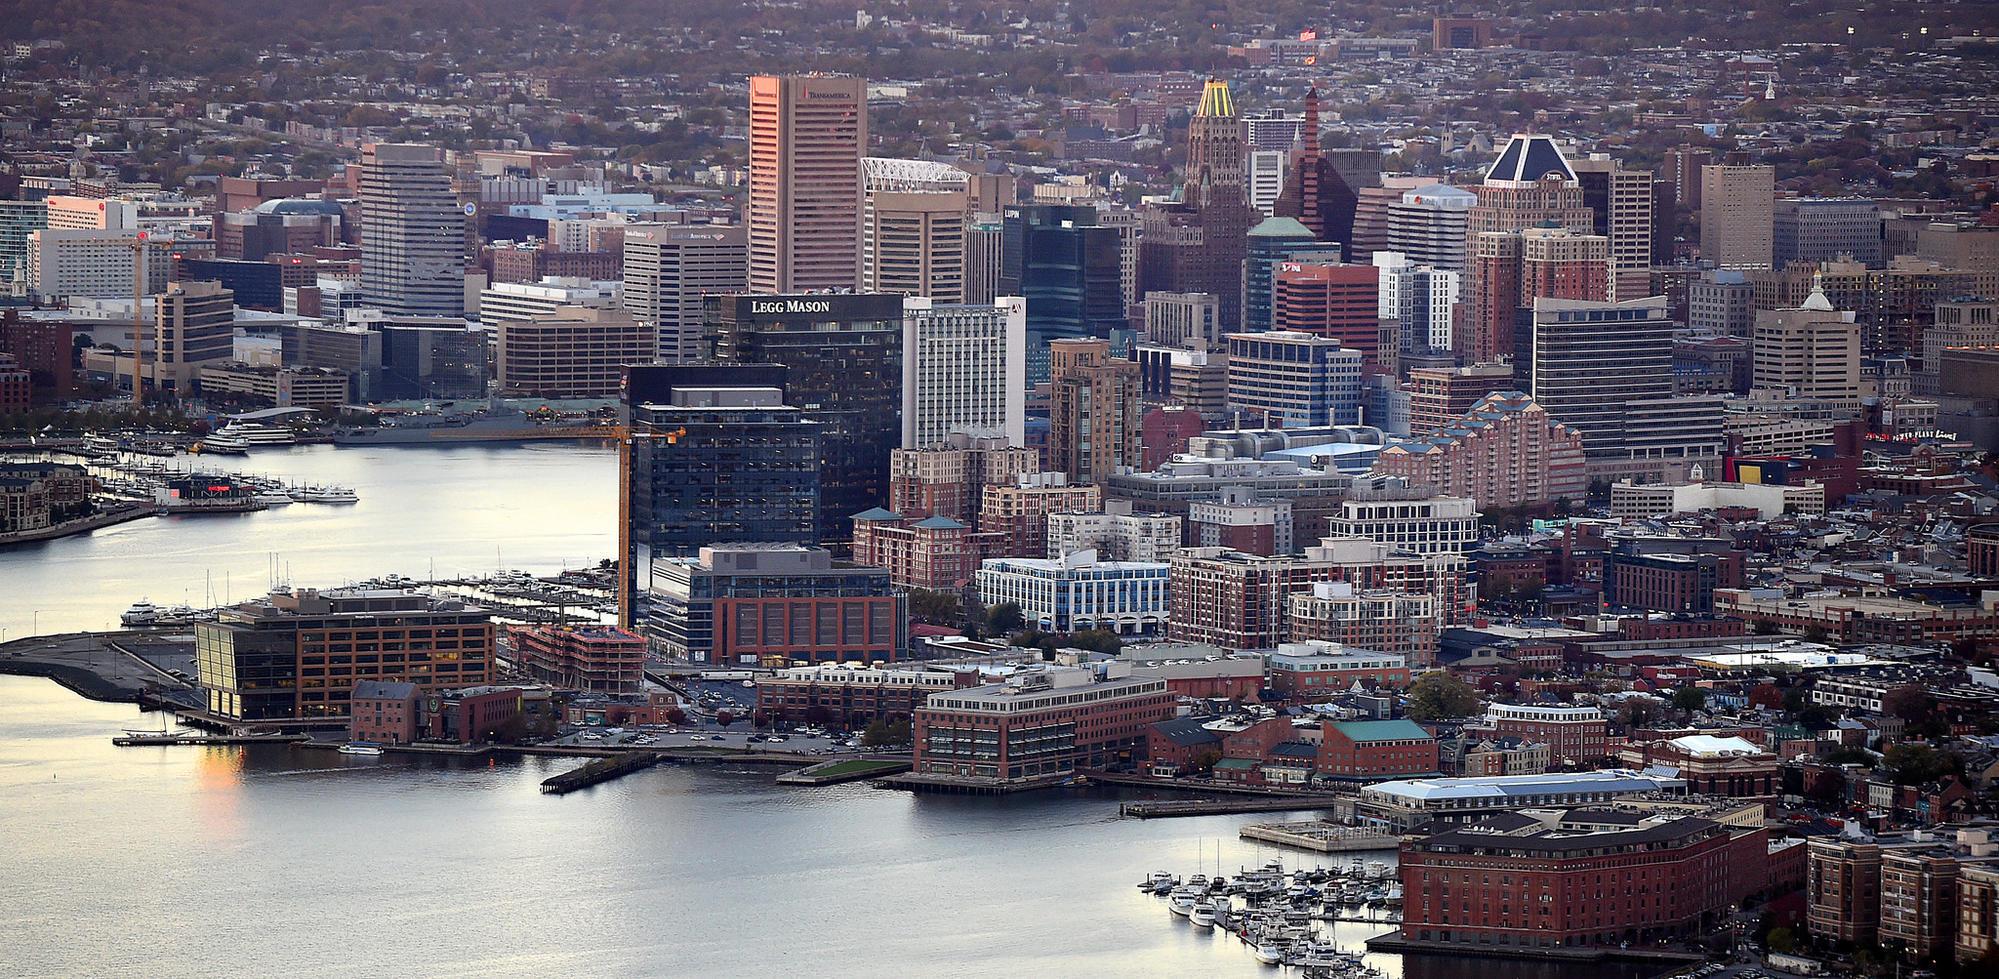 Baltimore exodus as homicides soar